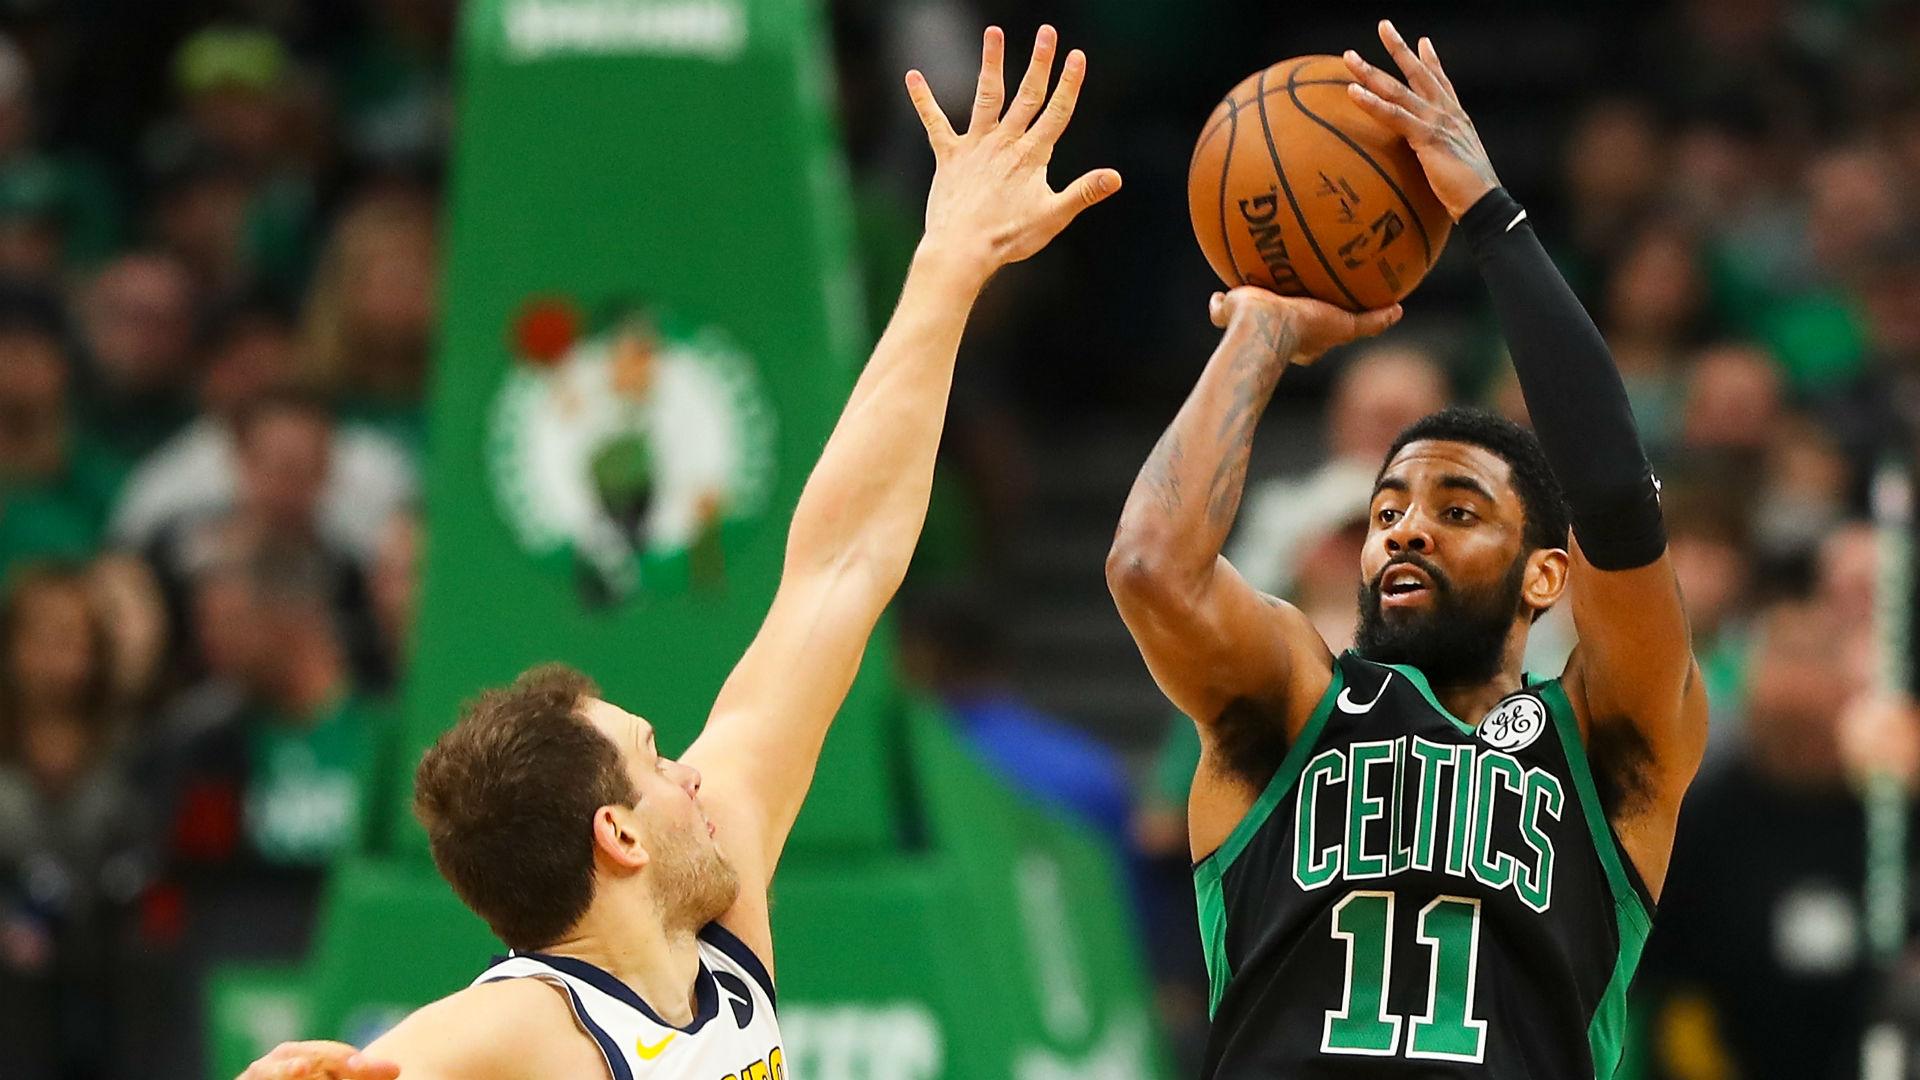 Nba Playoffs 2019 Live Updates From Pacers Celtics